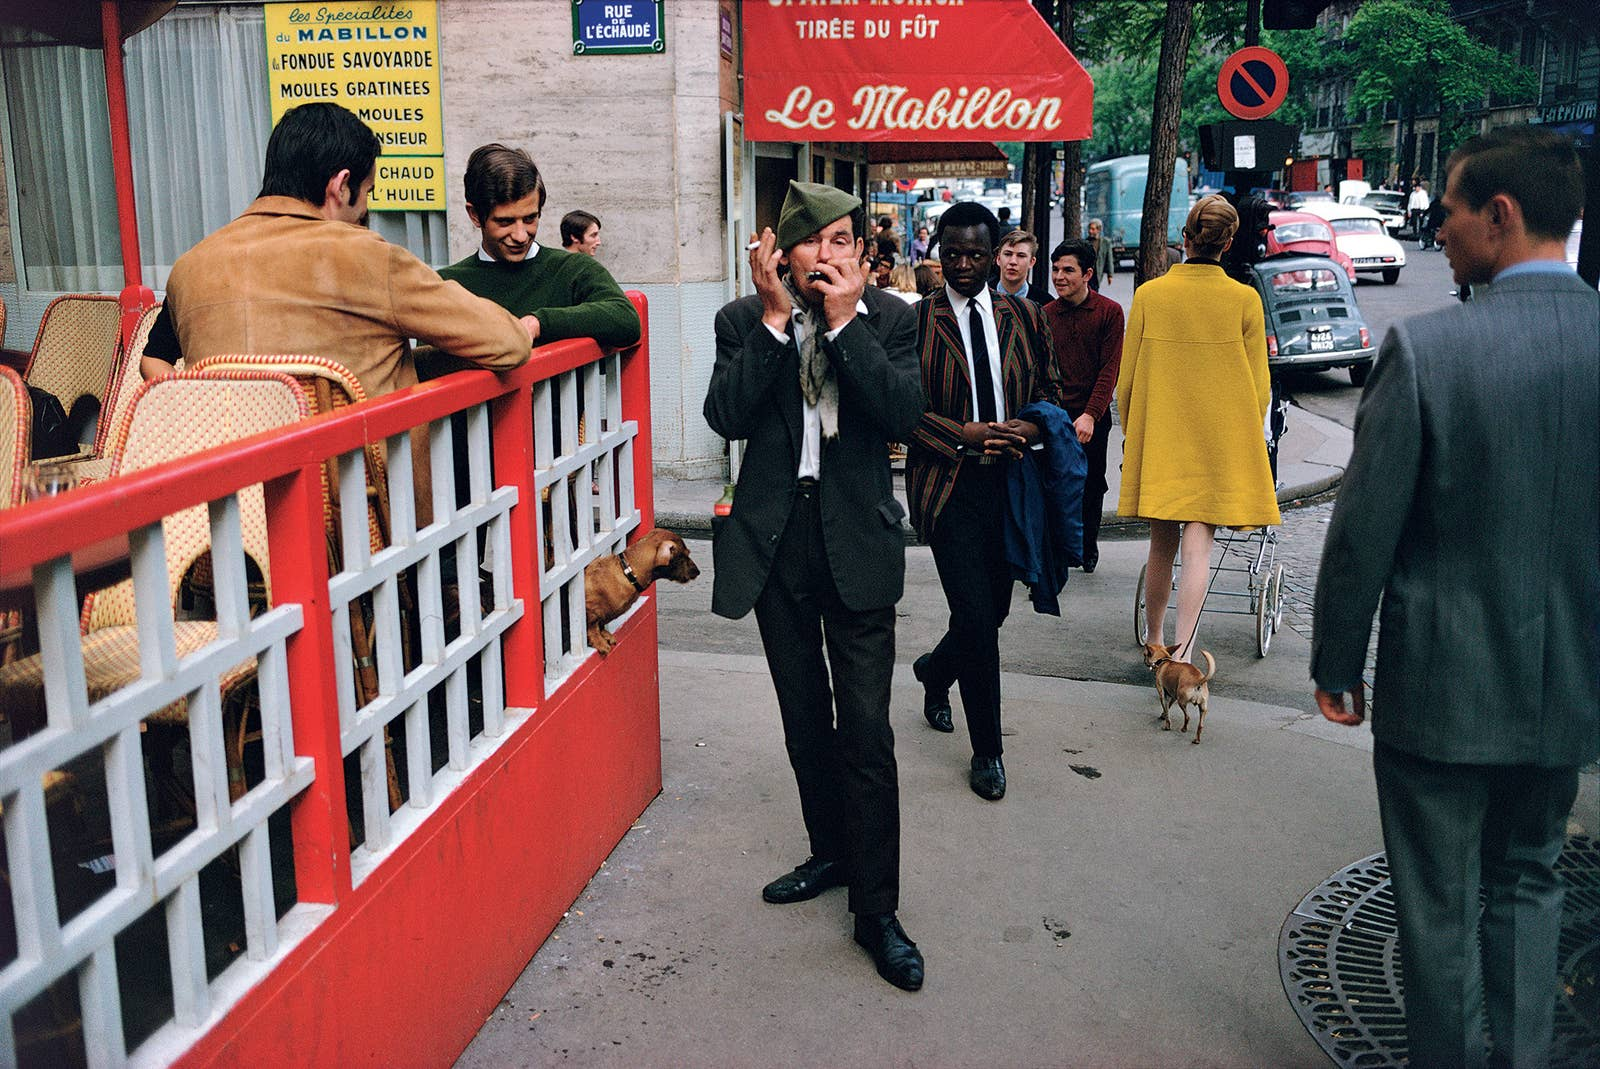 A man plays harmonica on a crowded city street